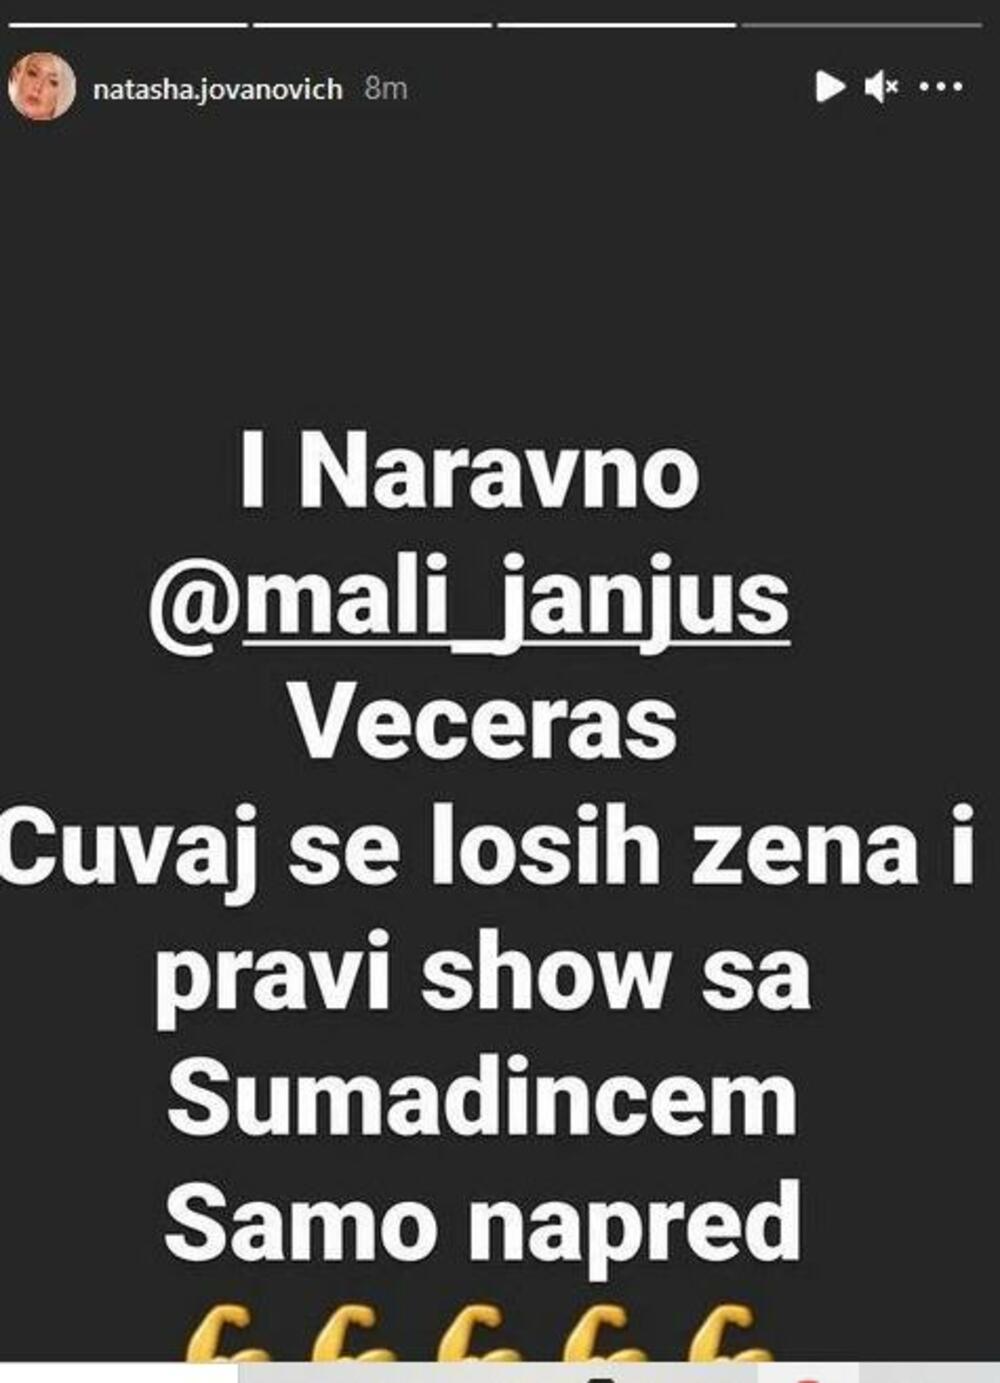 Nataša Jovanović Nale